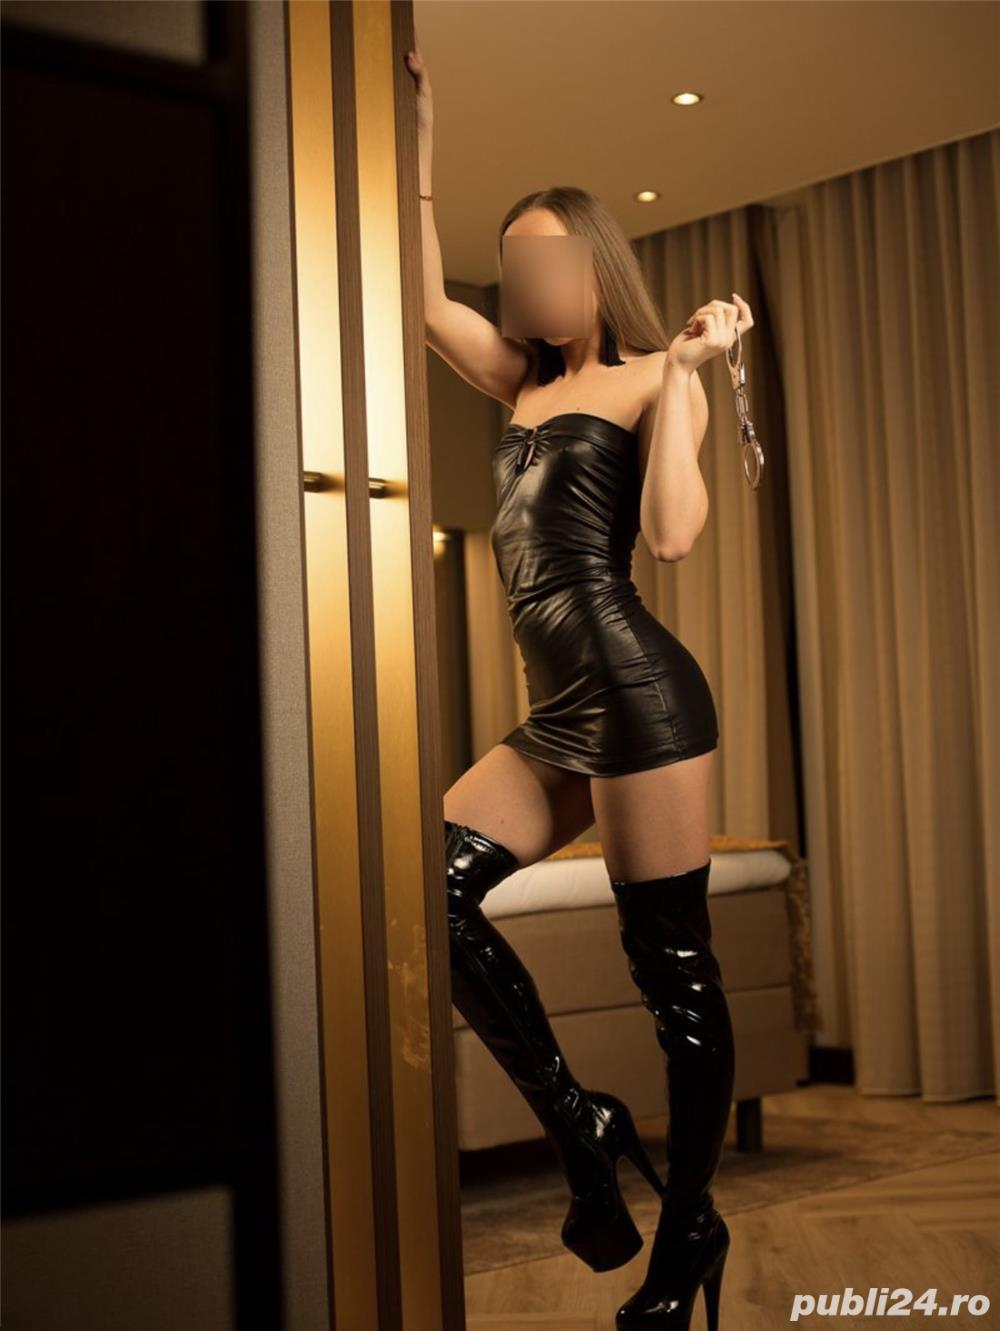 Luxury escort % reala  - imagine 4